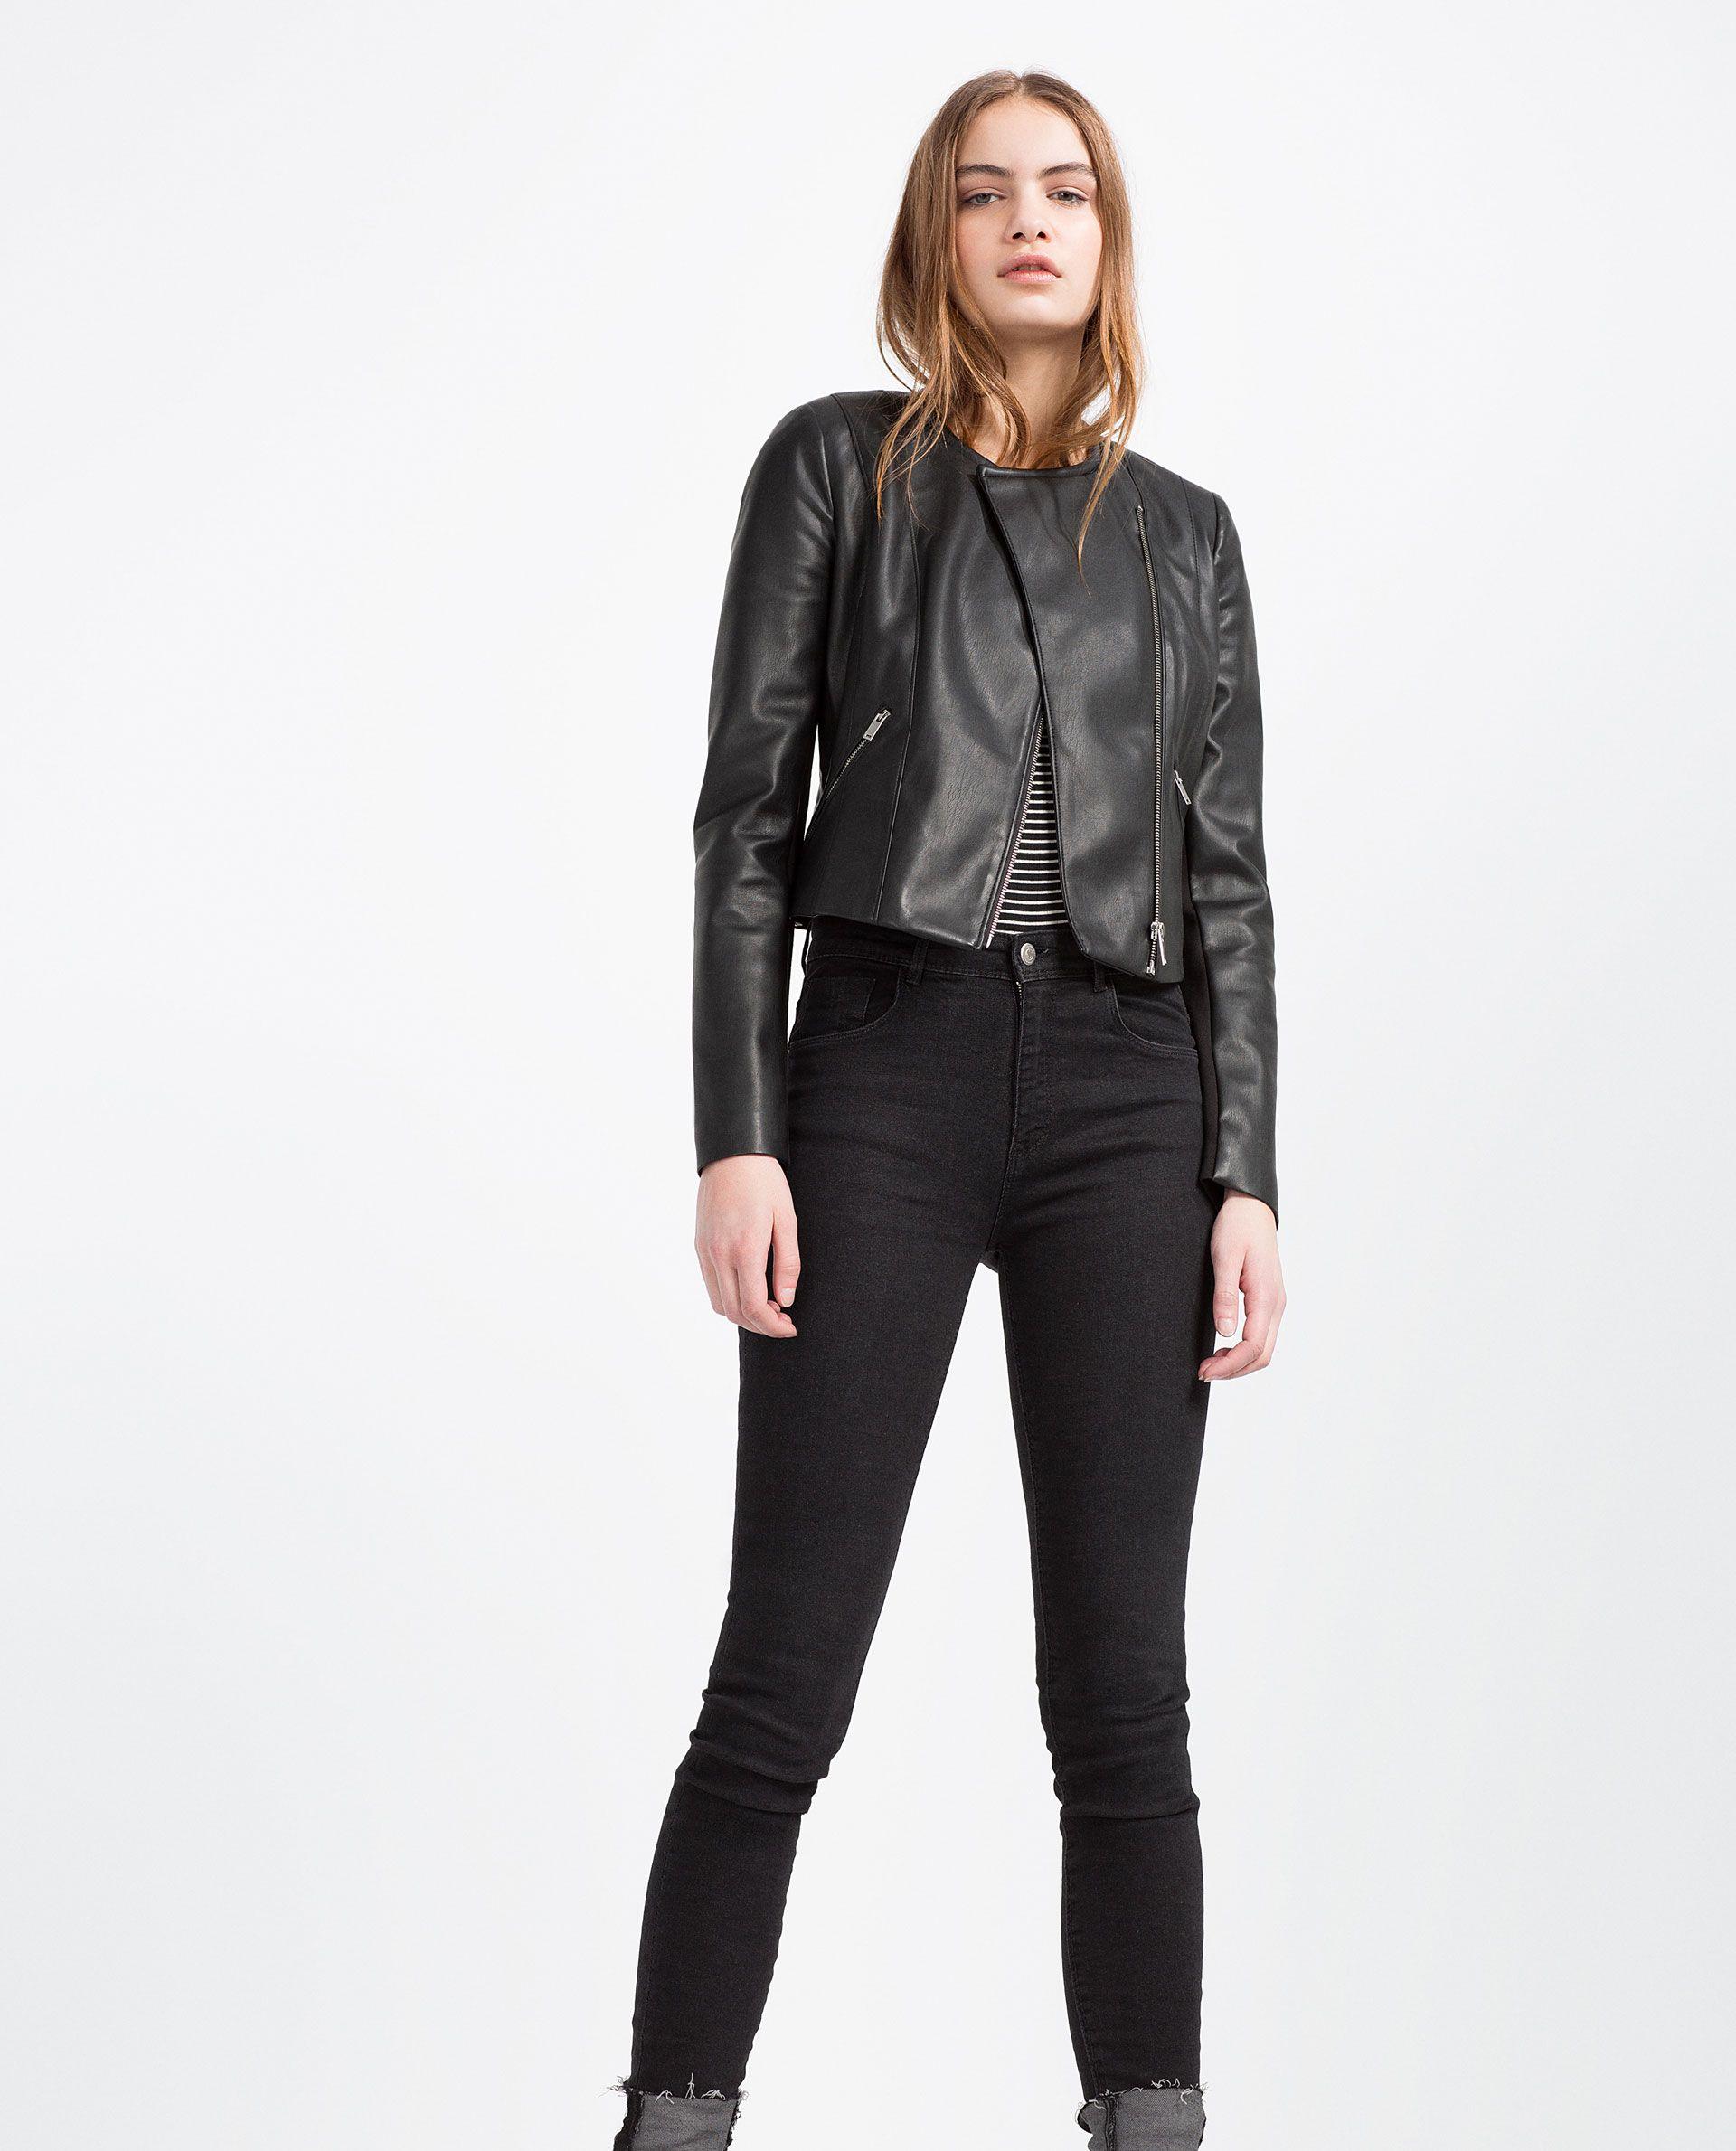 Zara online dames mantels